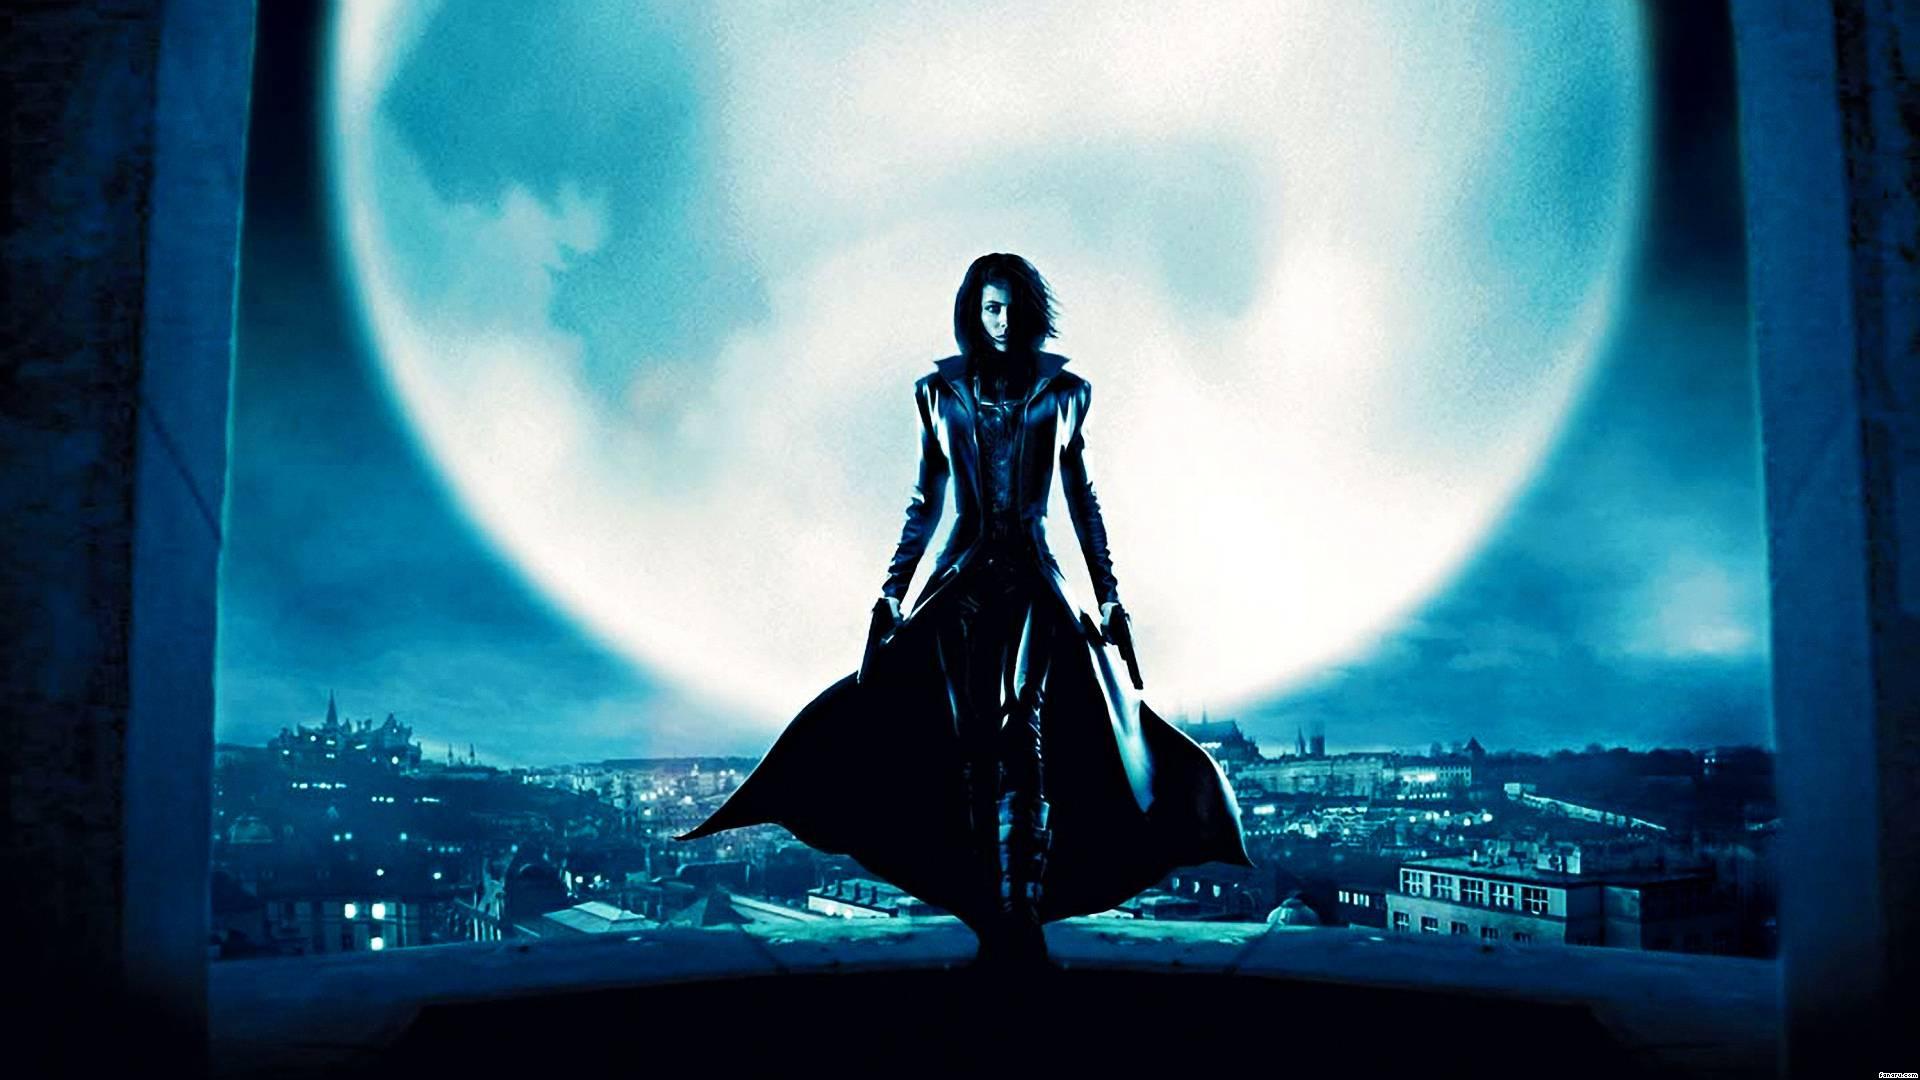 'Underworld: Blood Wars' Trailer is Finally Here